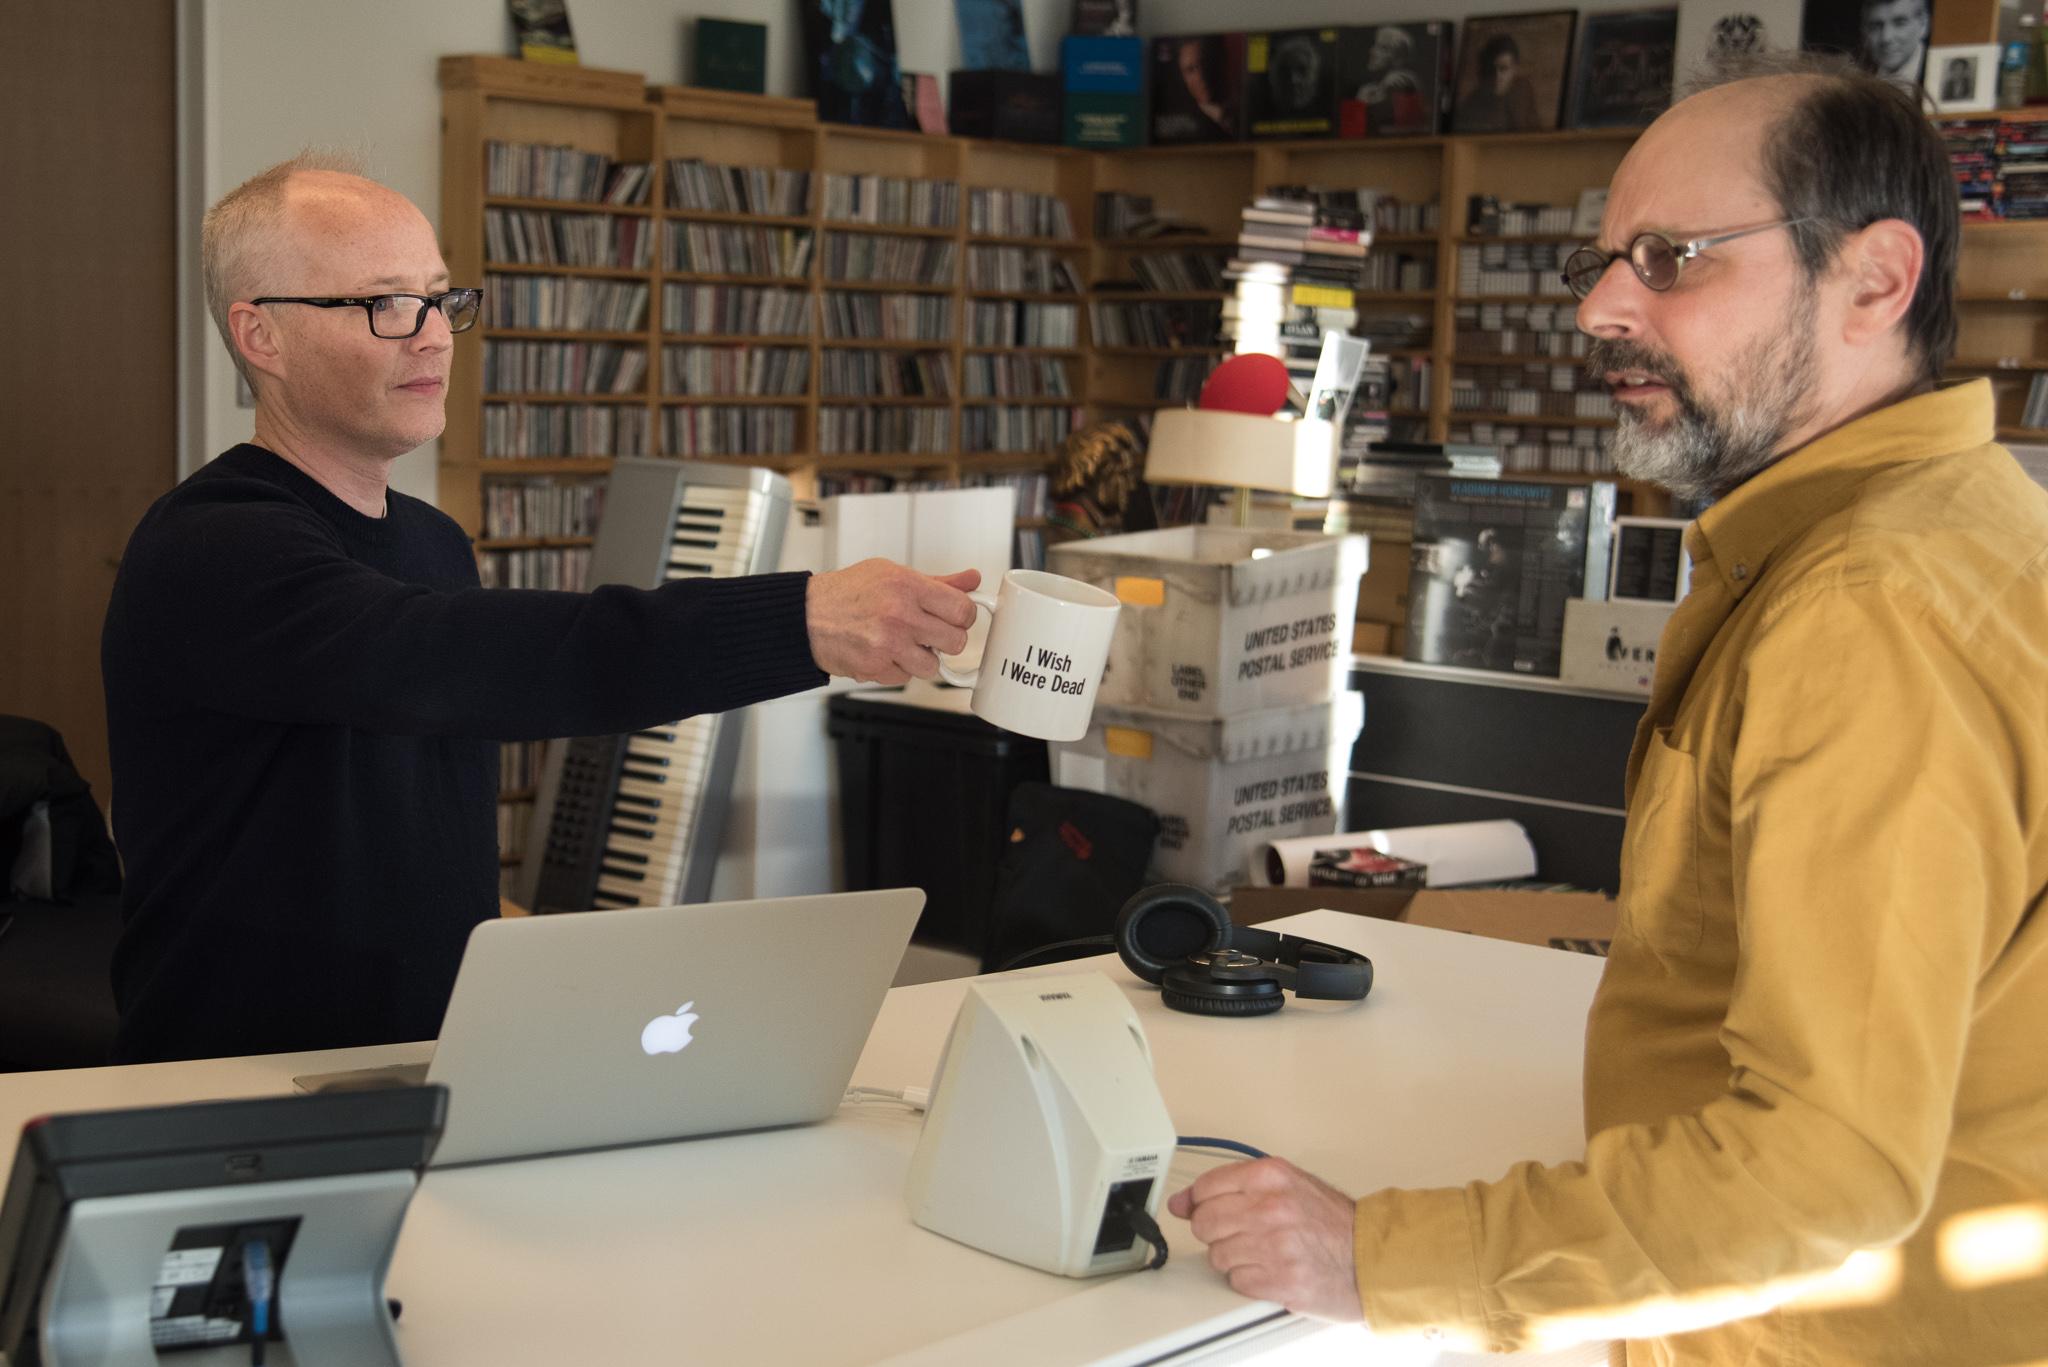 Bob Boilen bob boilen all songs considered anniversary interview